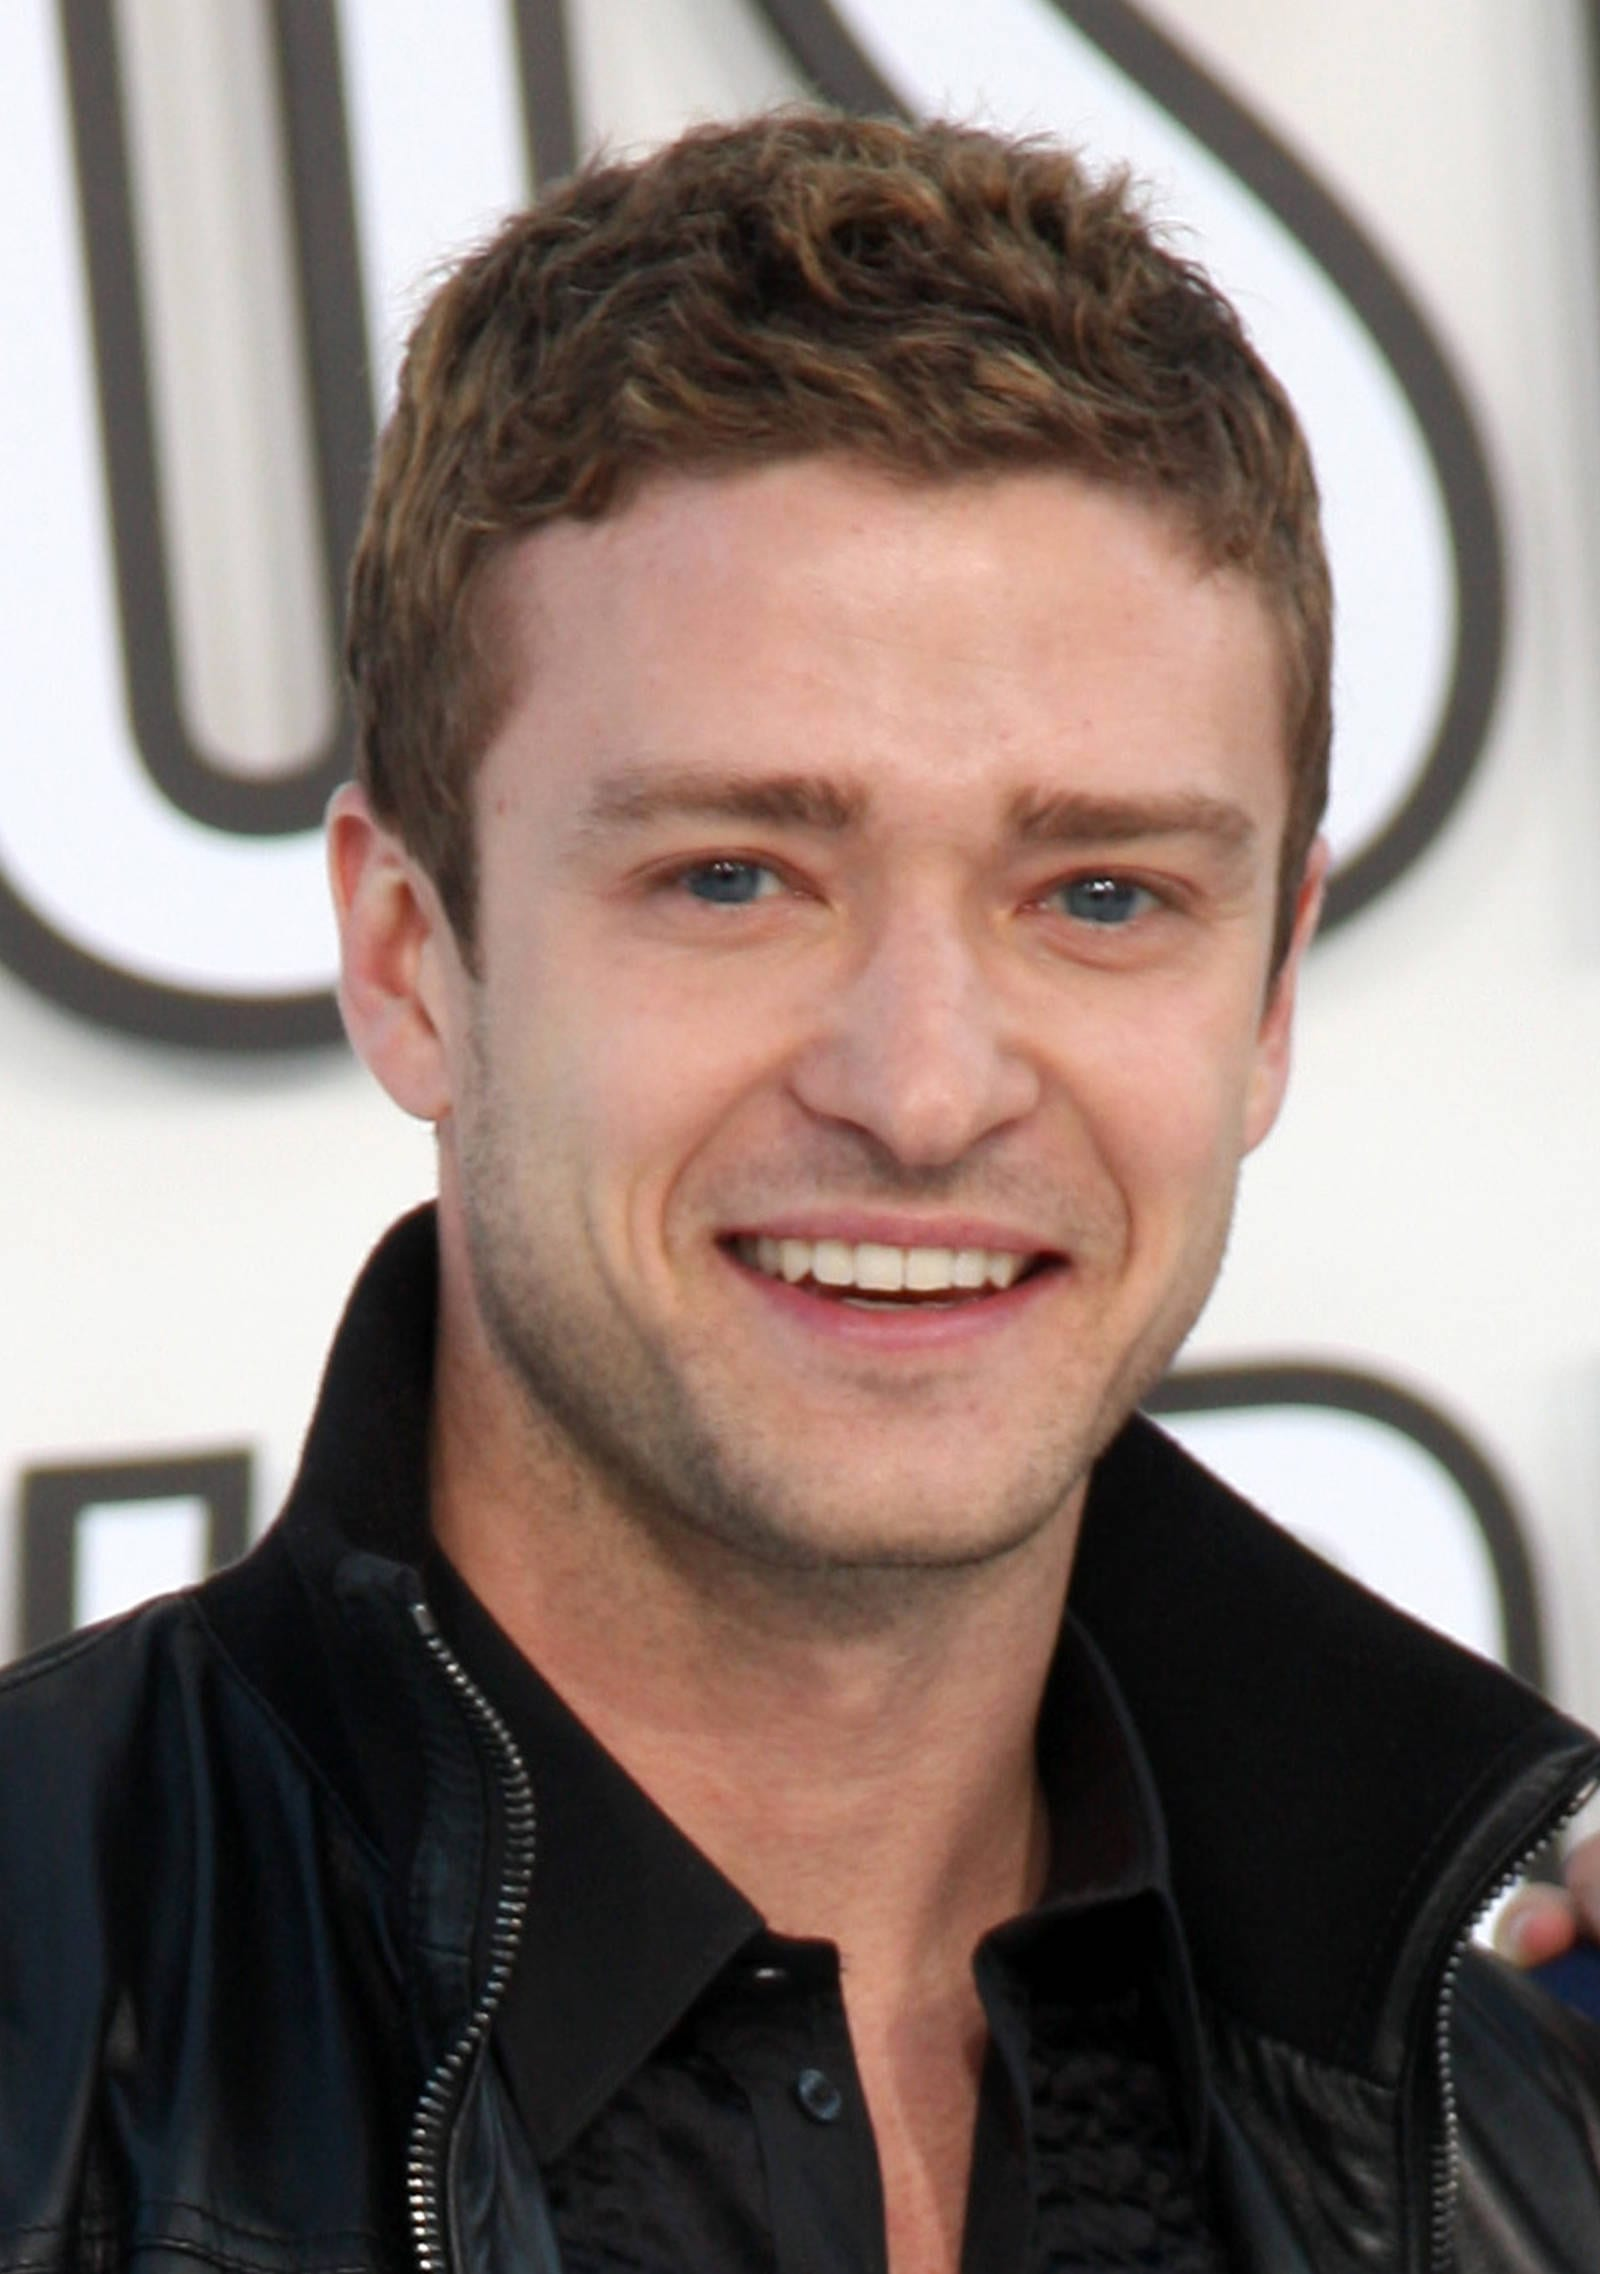 Justin Timberlake Messy Crew Cut